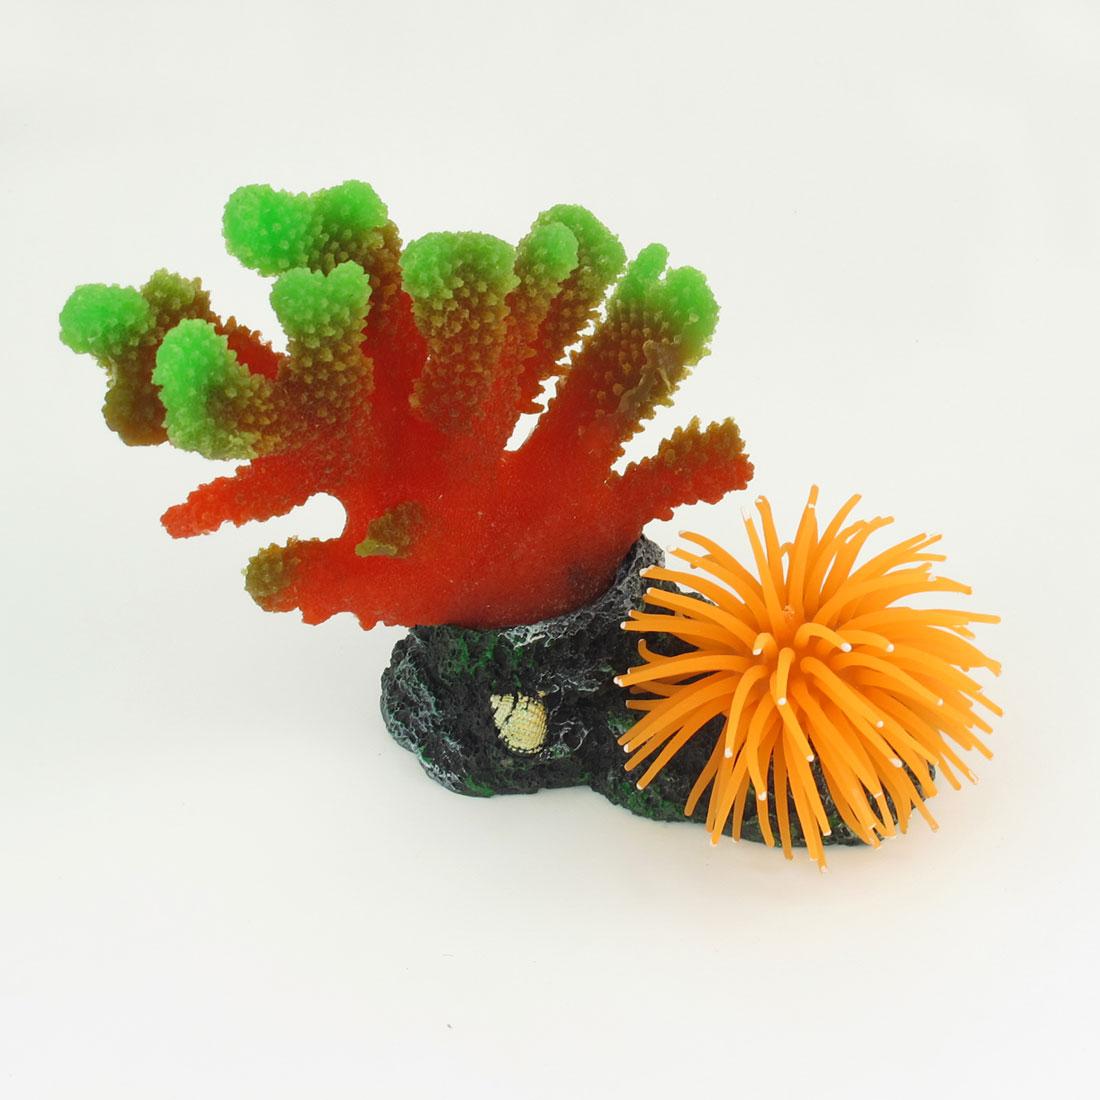 "5.5"" High Aquarium Red Orange Artificial Silicone Coral Anemone Ornament"